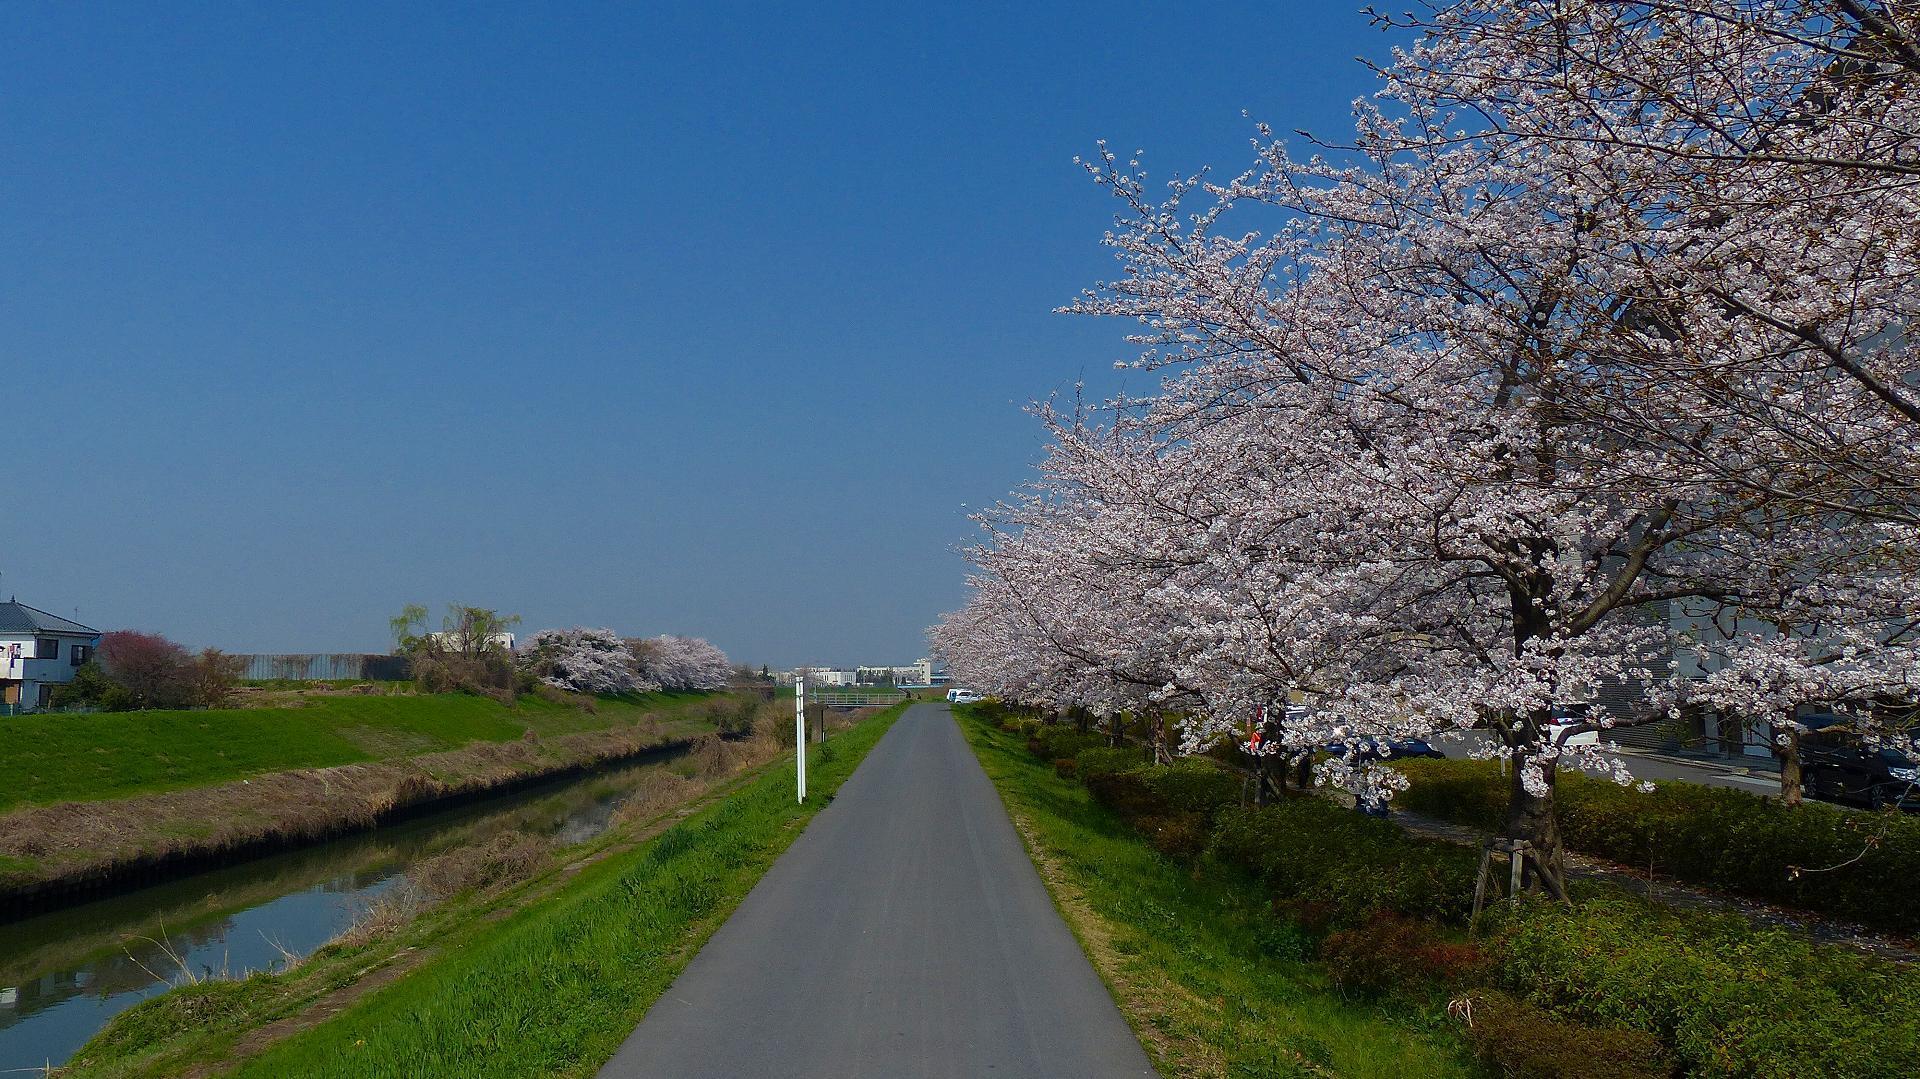 満開の桜を堪能! 【 2018 3/28(水) 】_a0185081_19273610.jpg